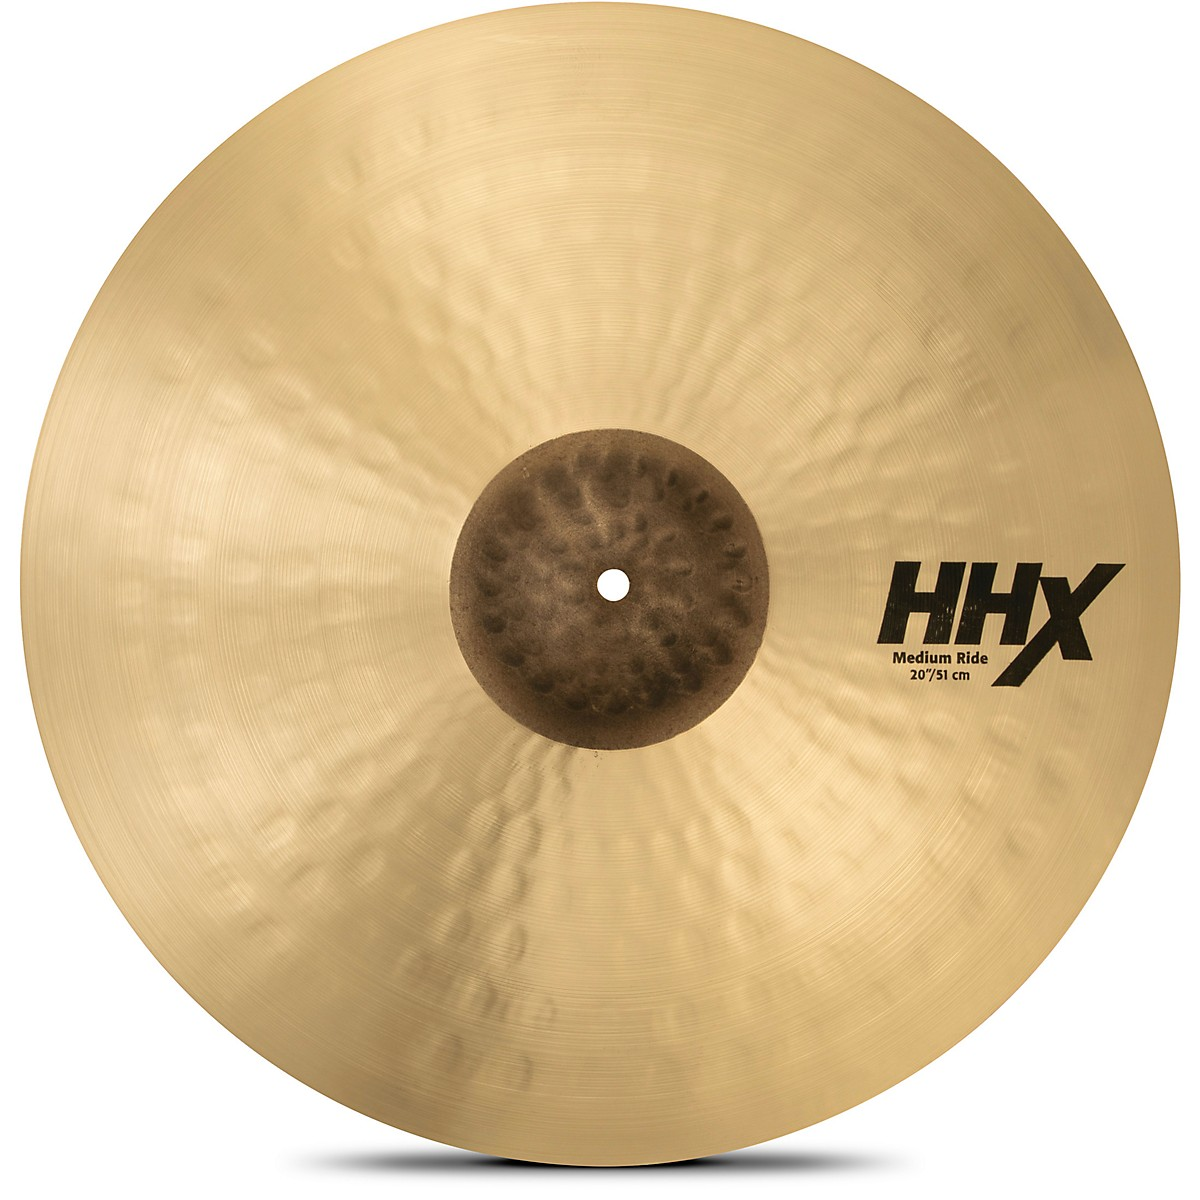 Sabian HHX Medium Ride Cymbal